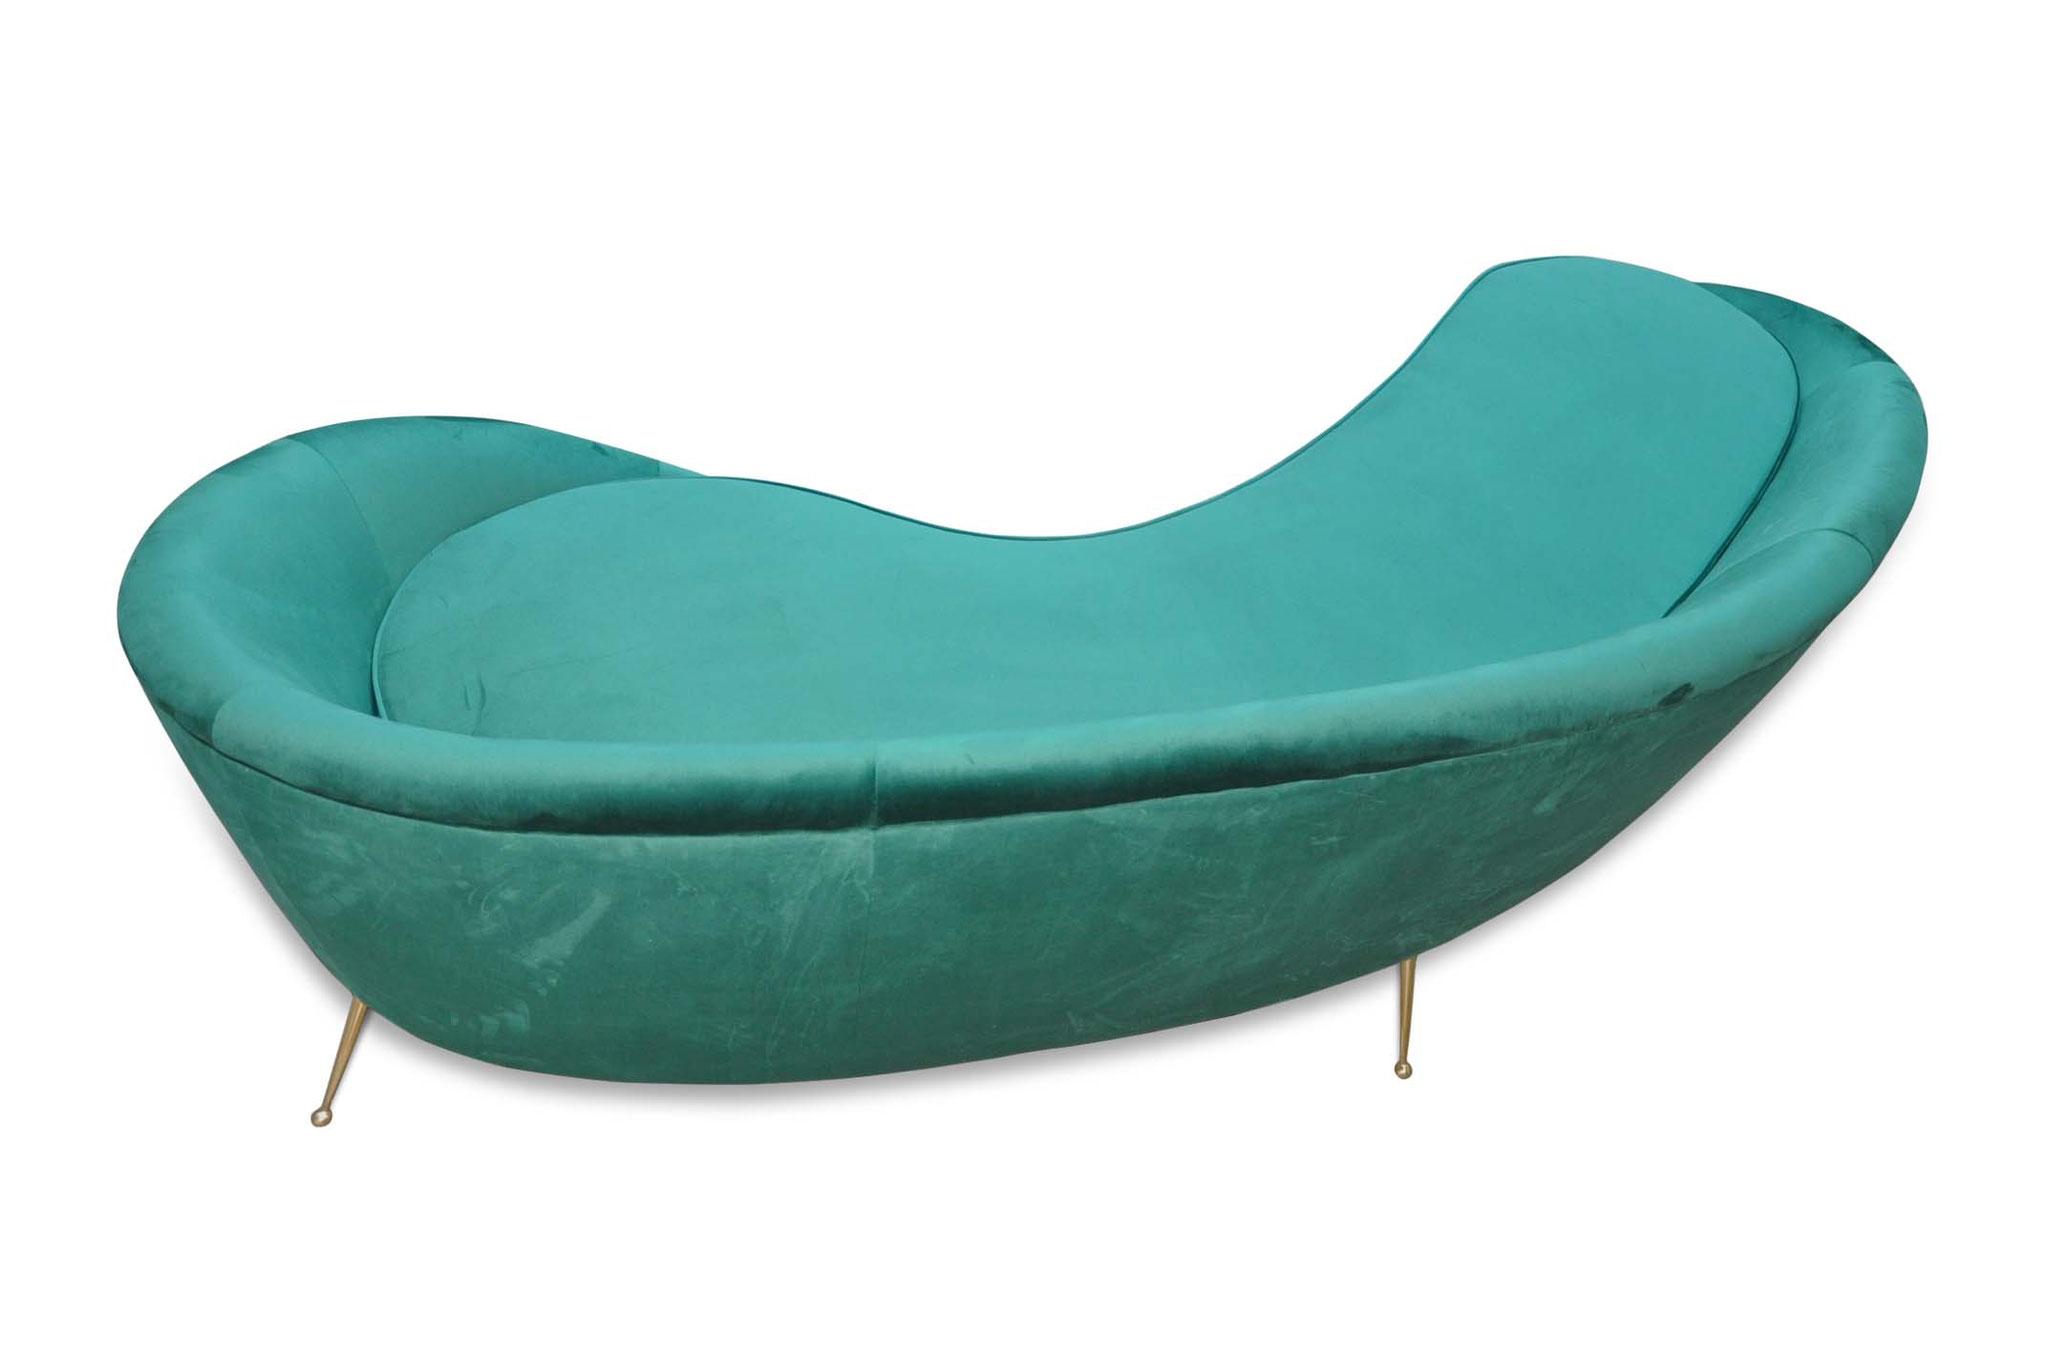 Divano curvo Ico Parisi mid century modern sofa